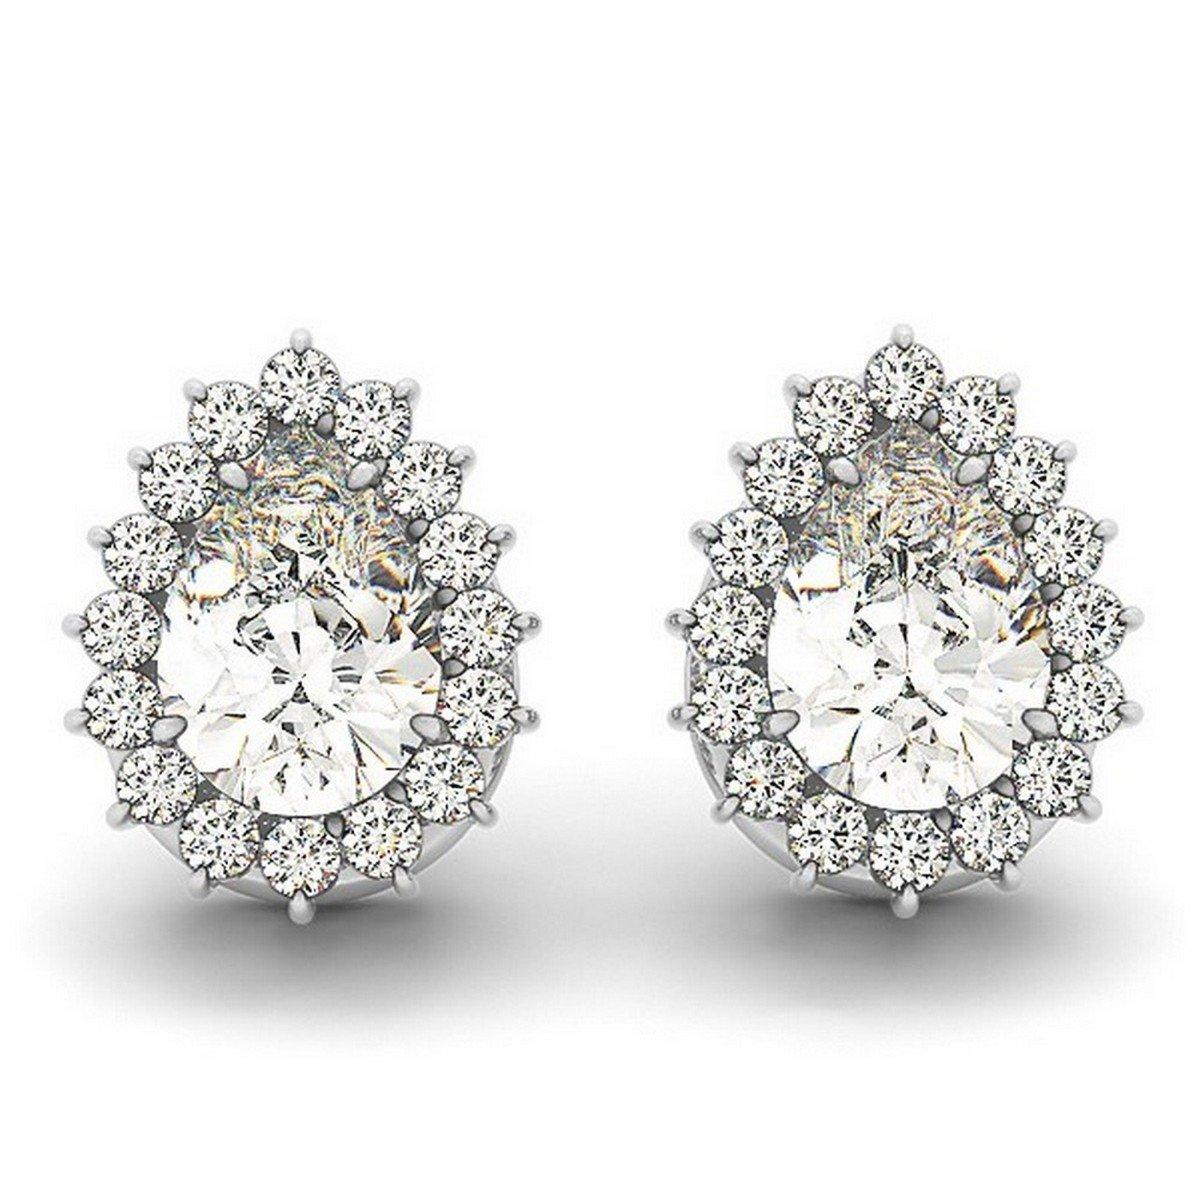 7d157e51353d2 Amazon.com: Ladies Unique Pear Shaped Diamond Teardrop Halo Stud ...